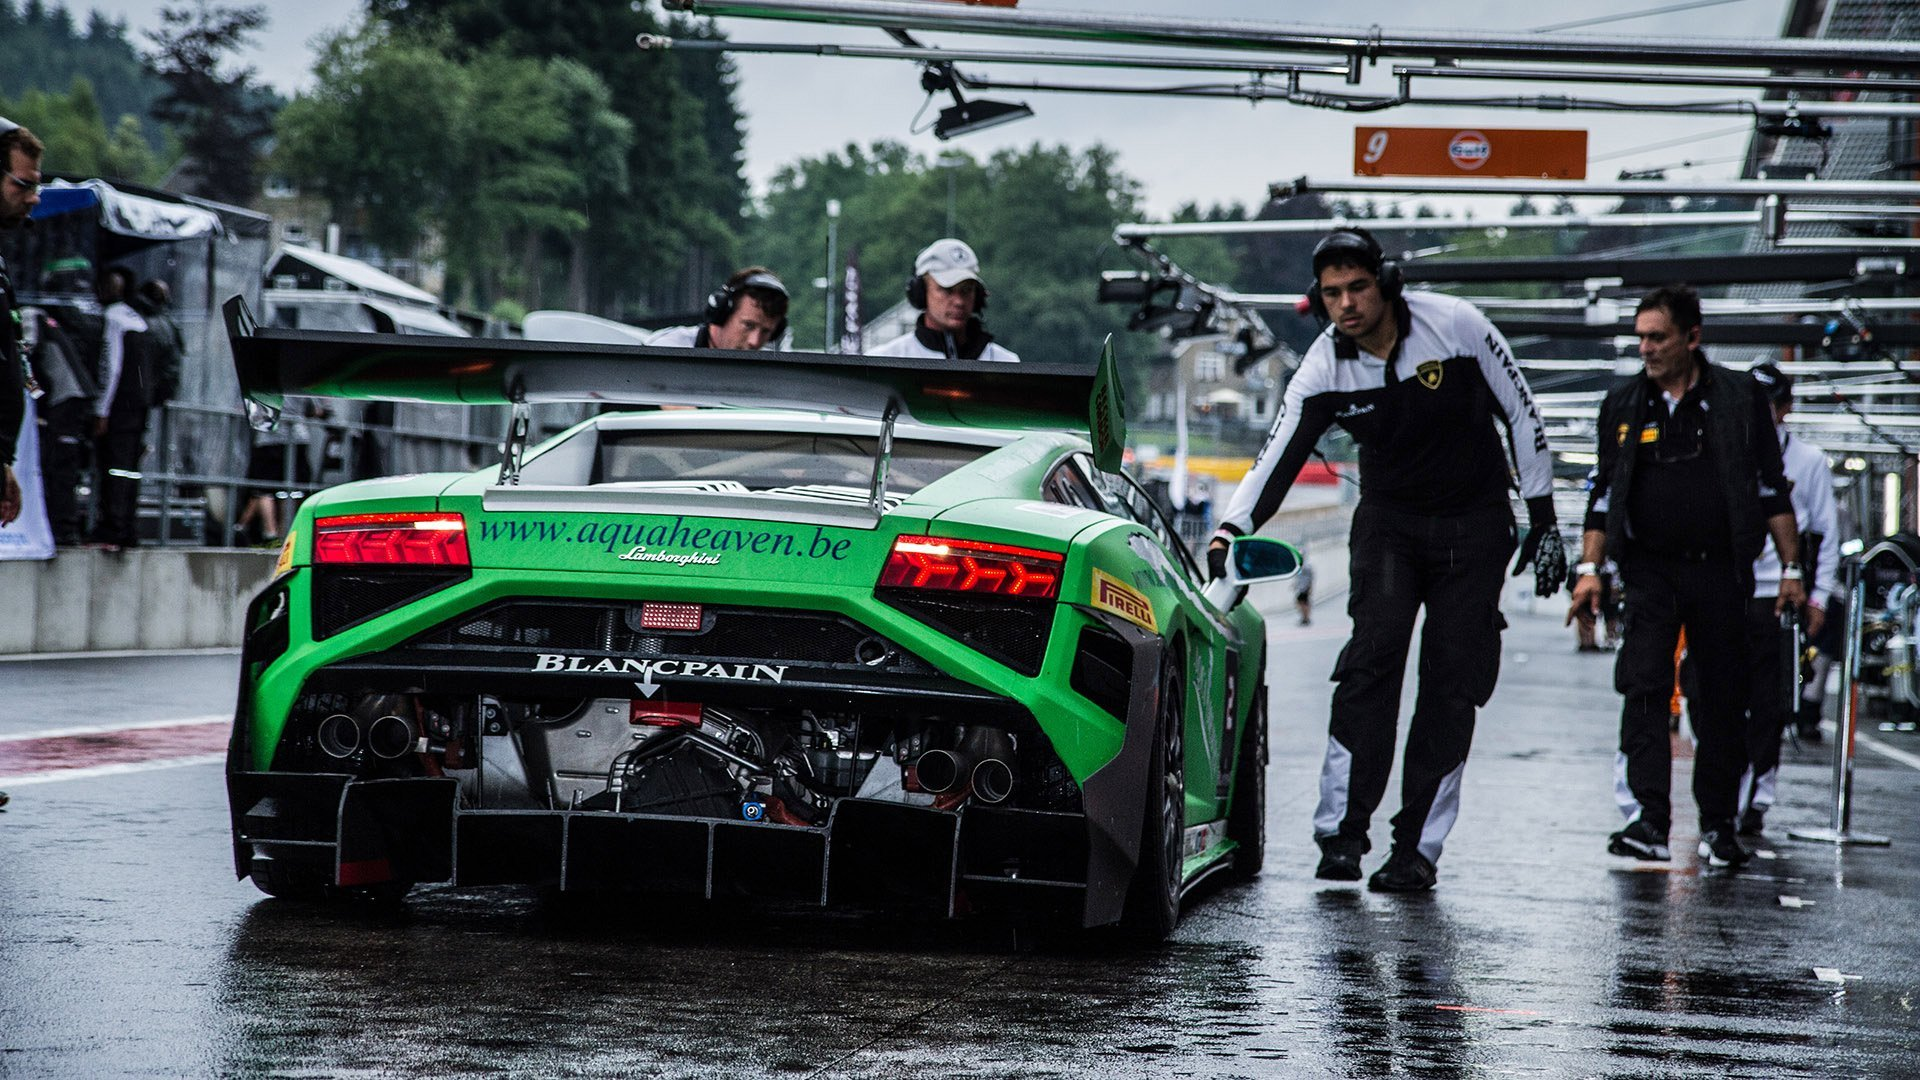 This Stunning Lamborghini Gallardo Race Car Is Your New Desktop